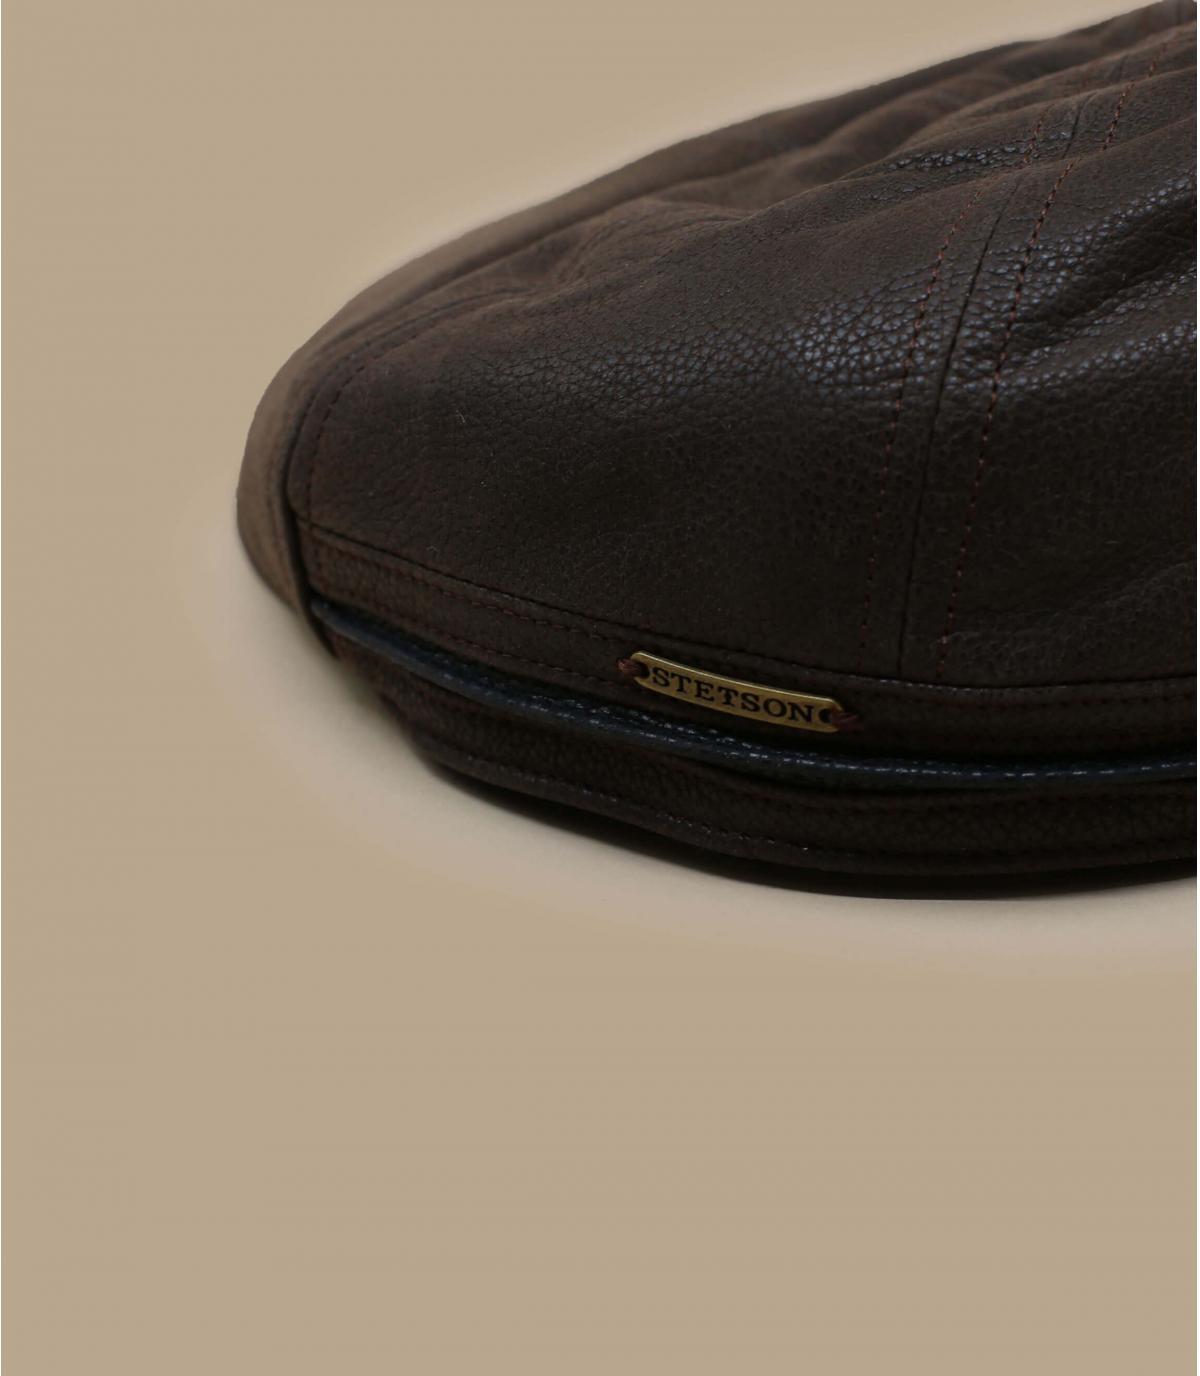 Details Redding Earflap Cowhide braun - Abbildung 2